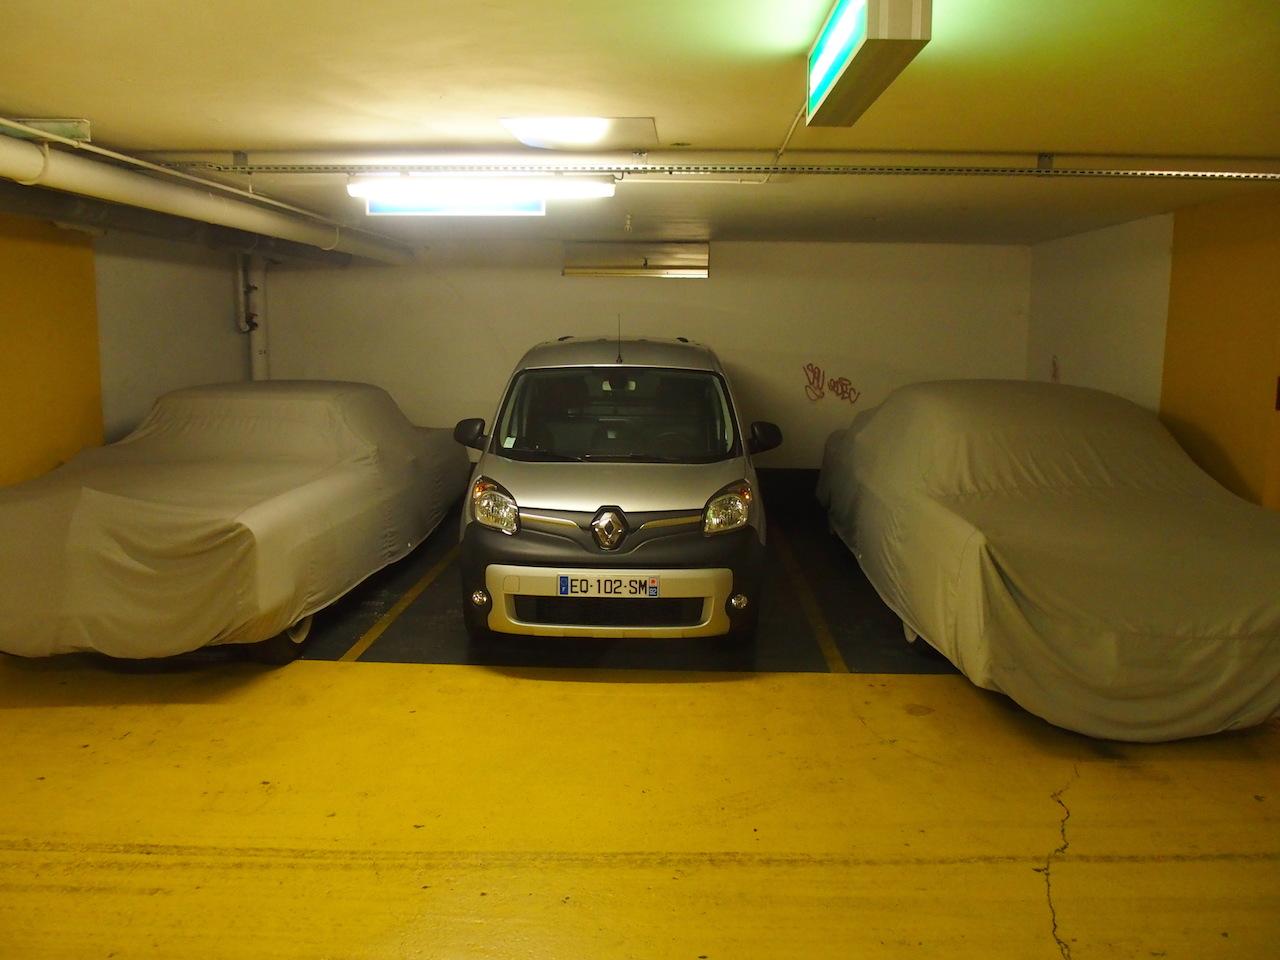 essai renault kangoo z e 190 tranquille blog automobile. Black Bedroom Furniture Sets. Home Design Ideas